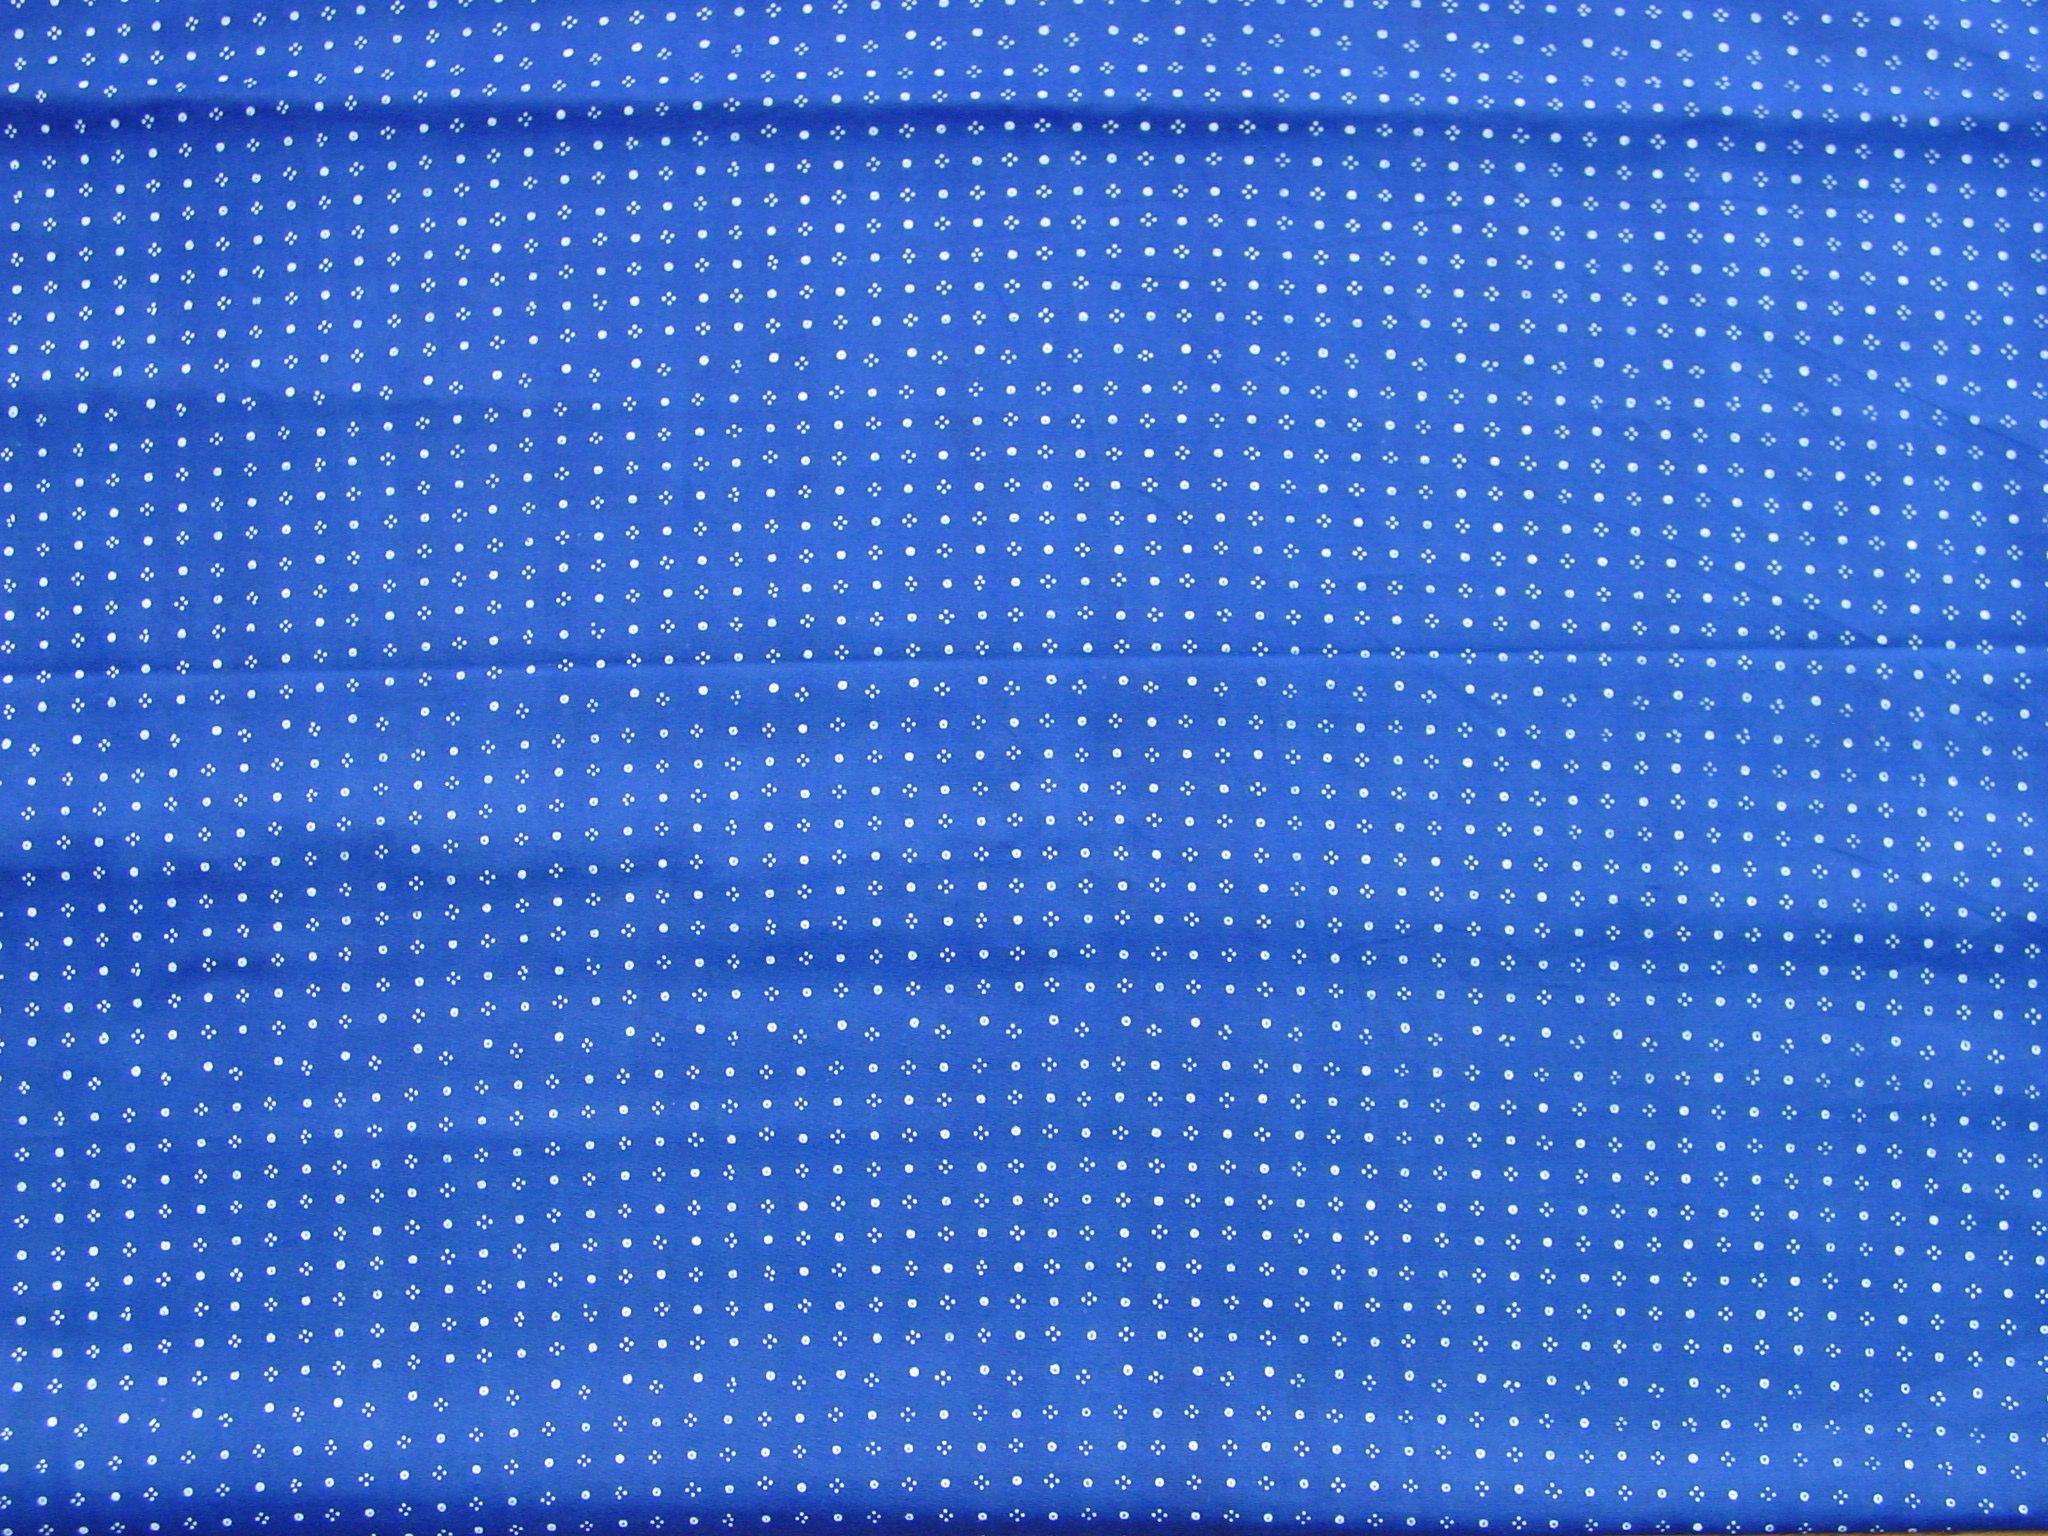 Blaudruckstoff 230-0